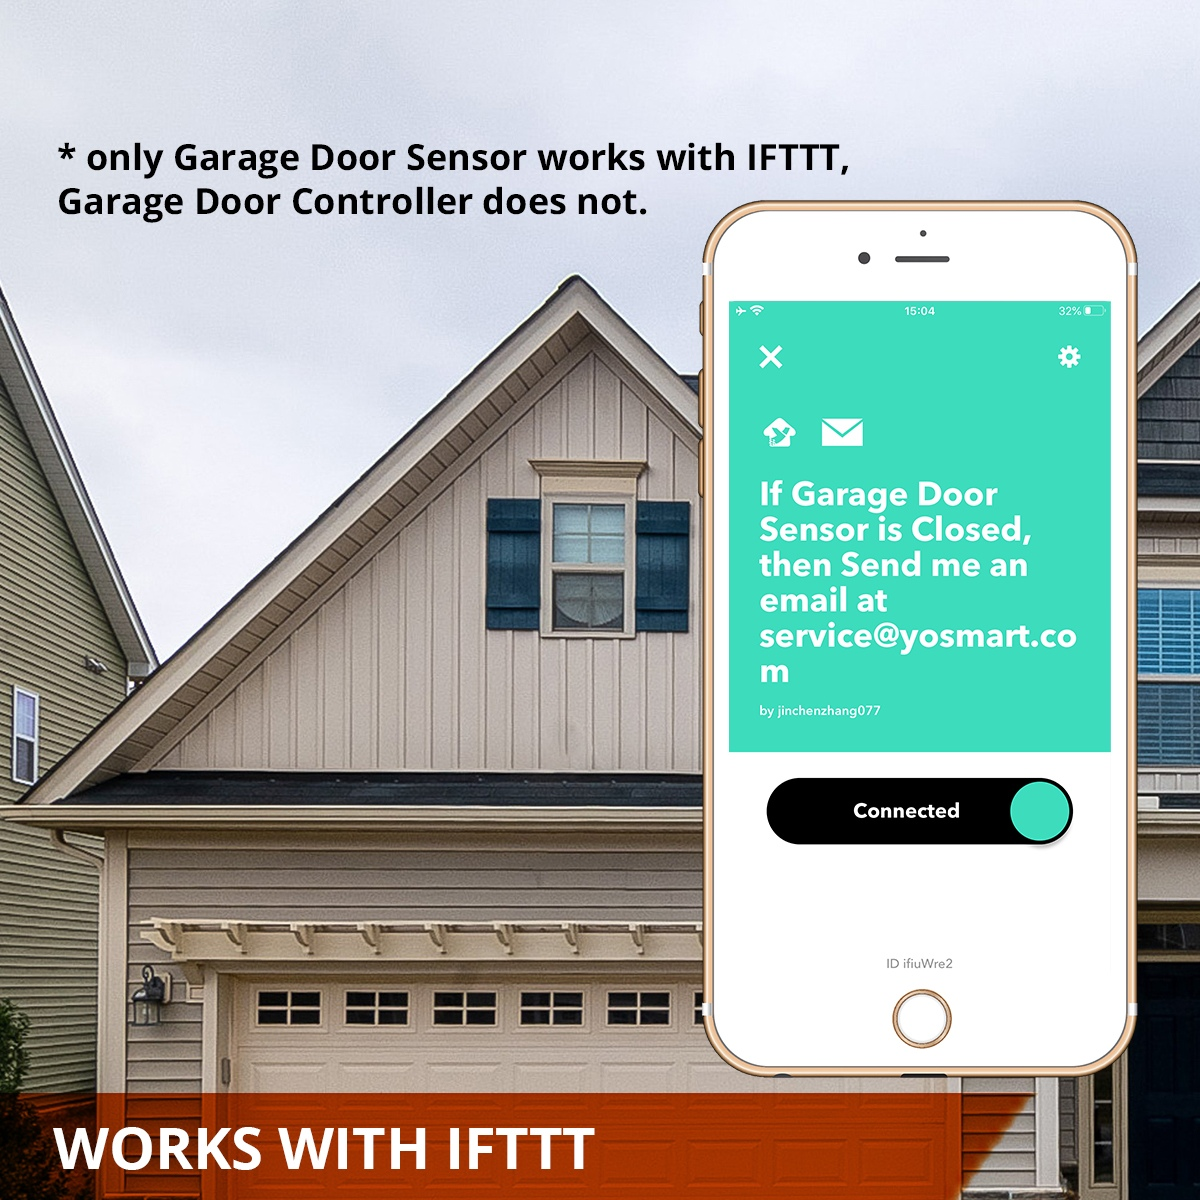 Hub+Garage Door Kit YoLink Hub Included Smart Garage Door Opener LoRa enabled YoLink Garage Door Kit Garage Door Controller /& Sensor with Smartphone Control